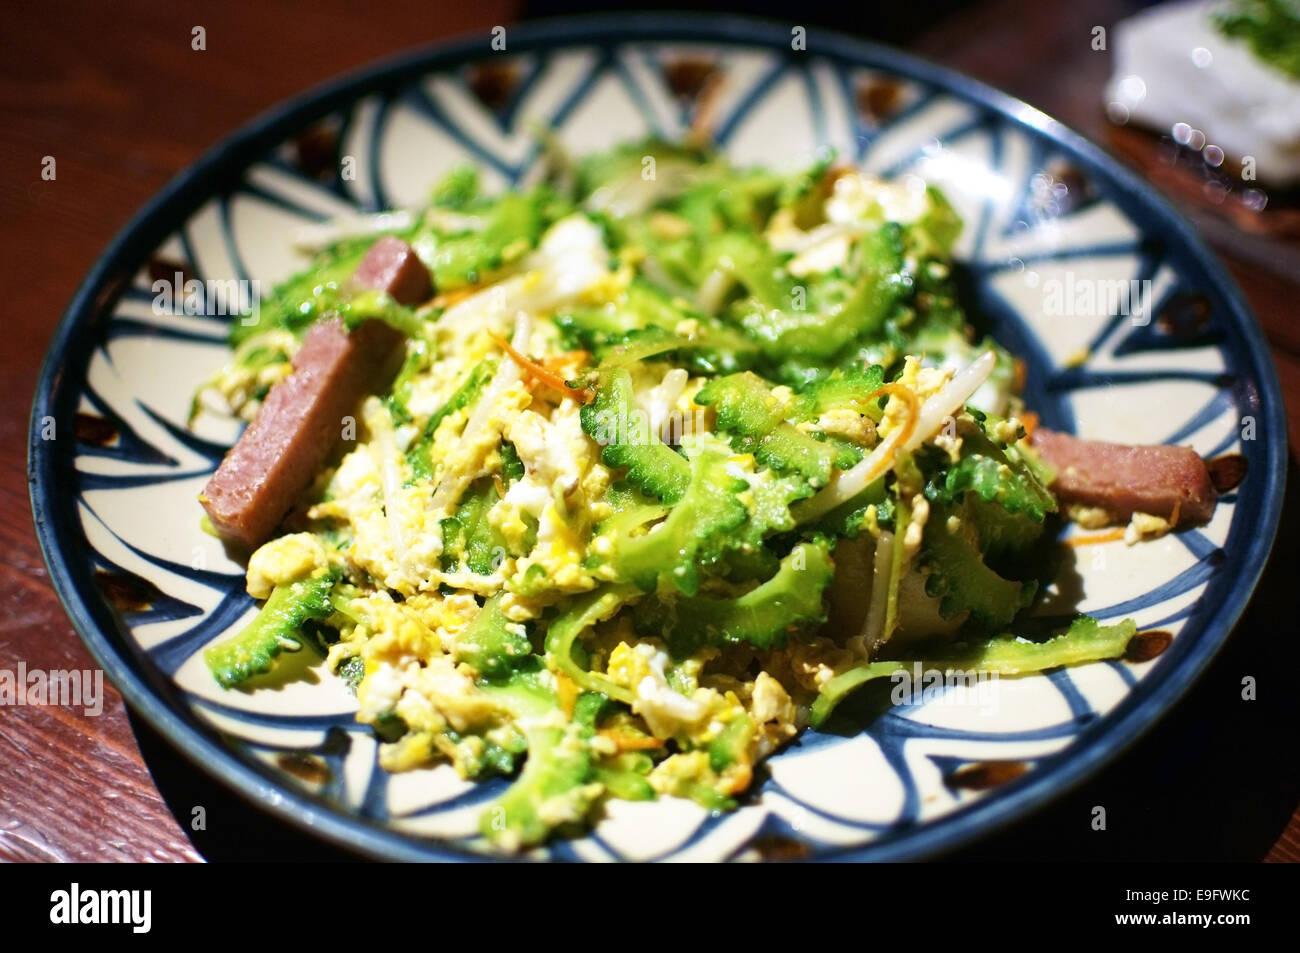 Okinawan Cuisine - Stock Image